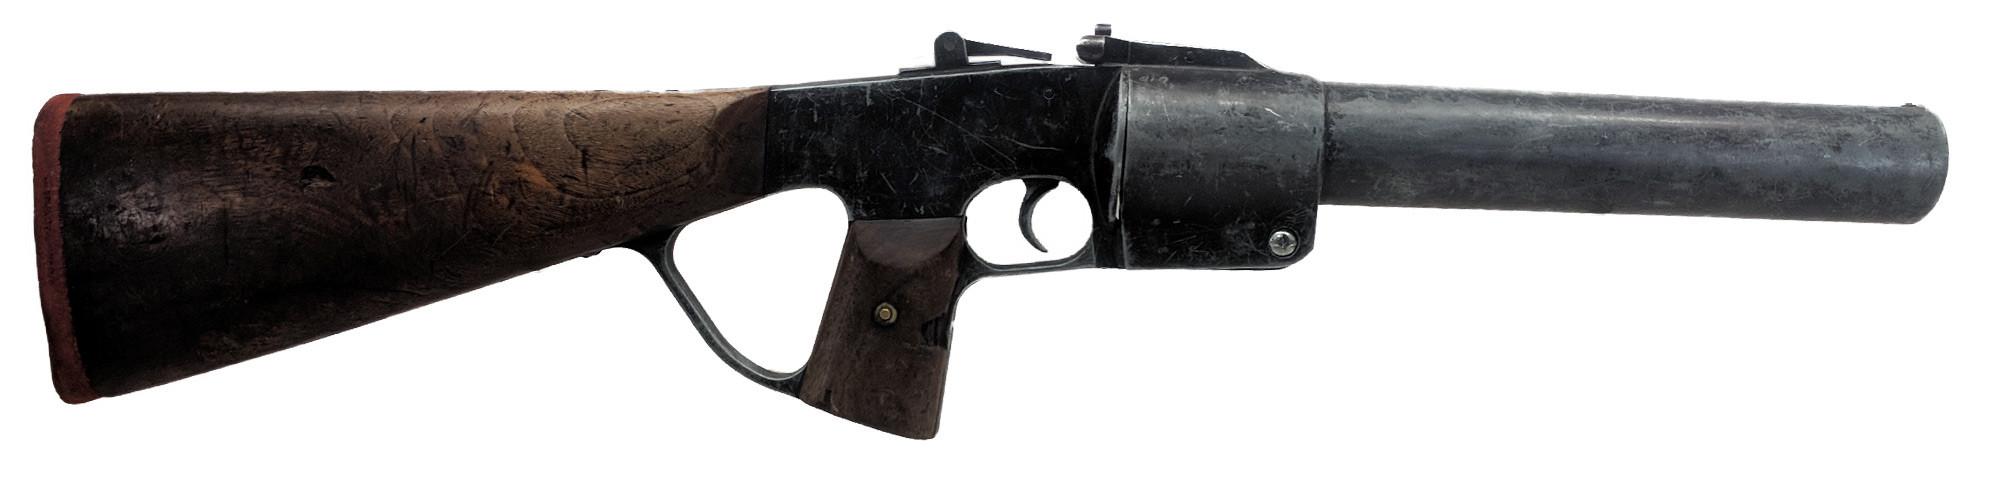 Federal Labs 201-Z 37mm Gas / Riot Gun